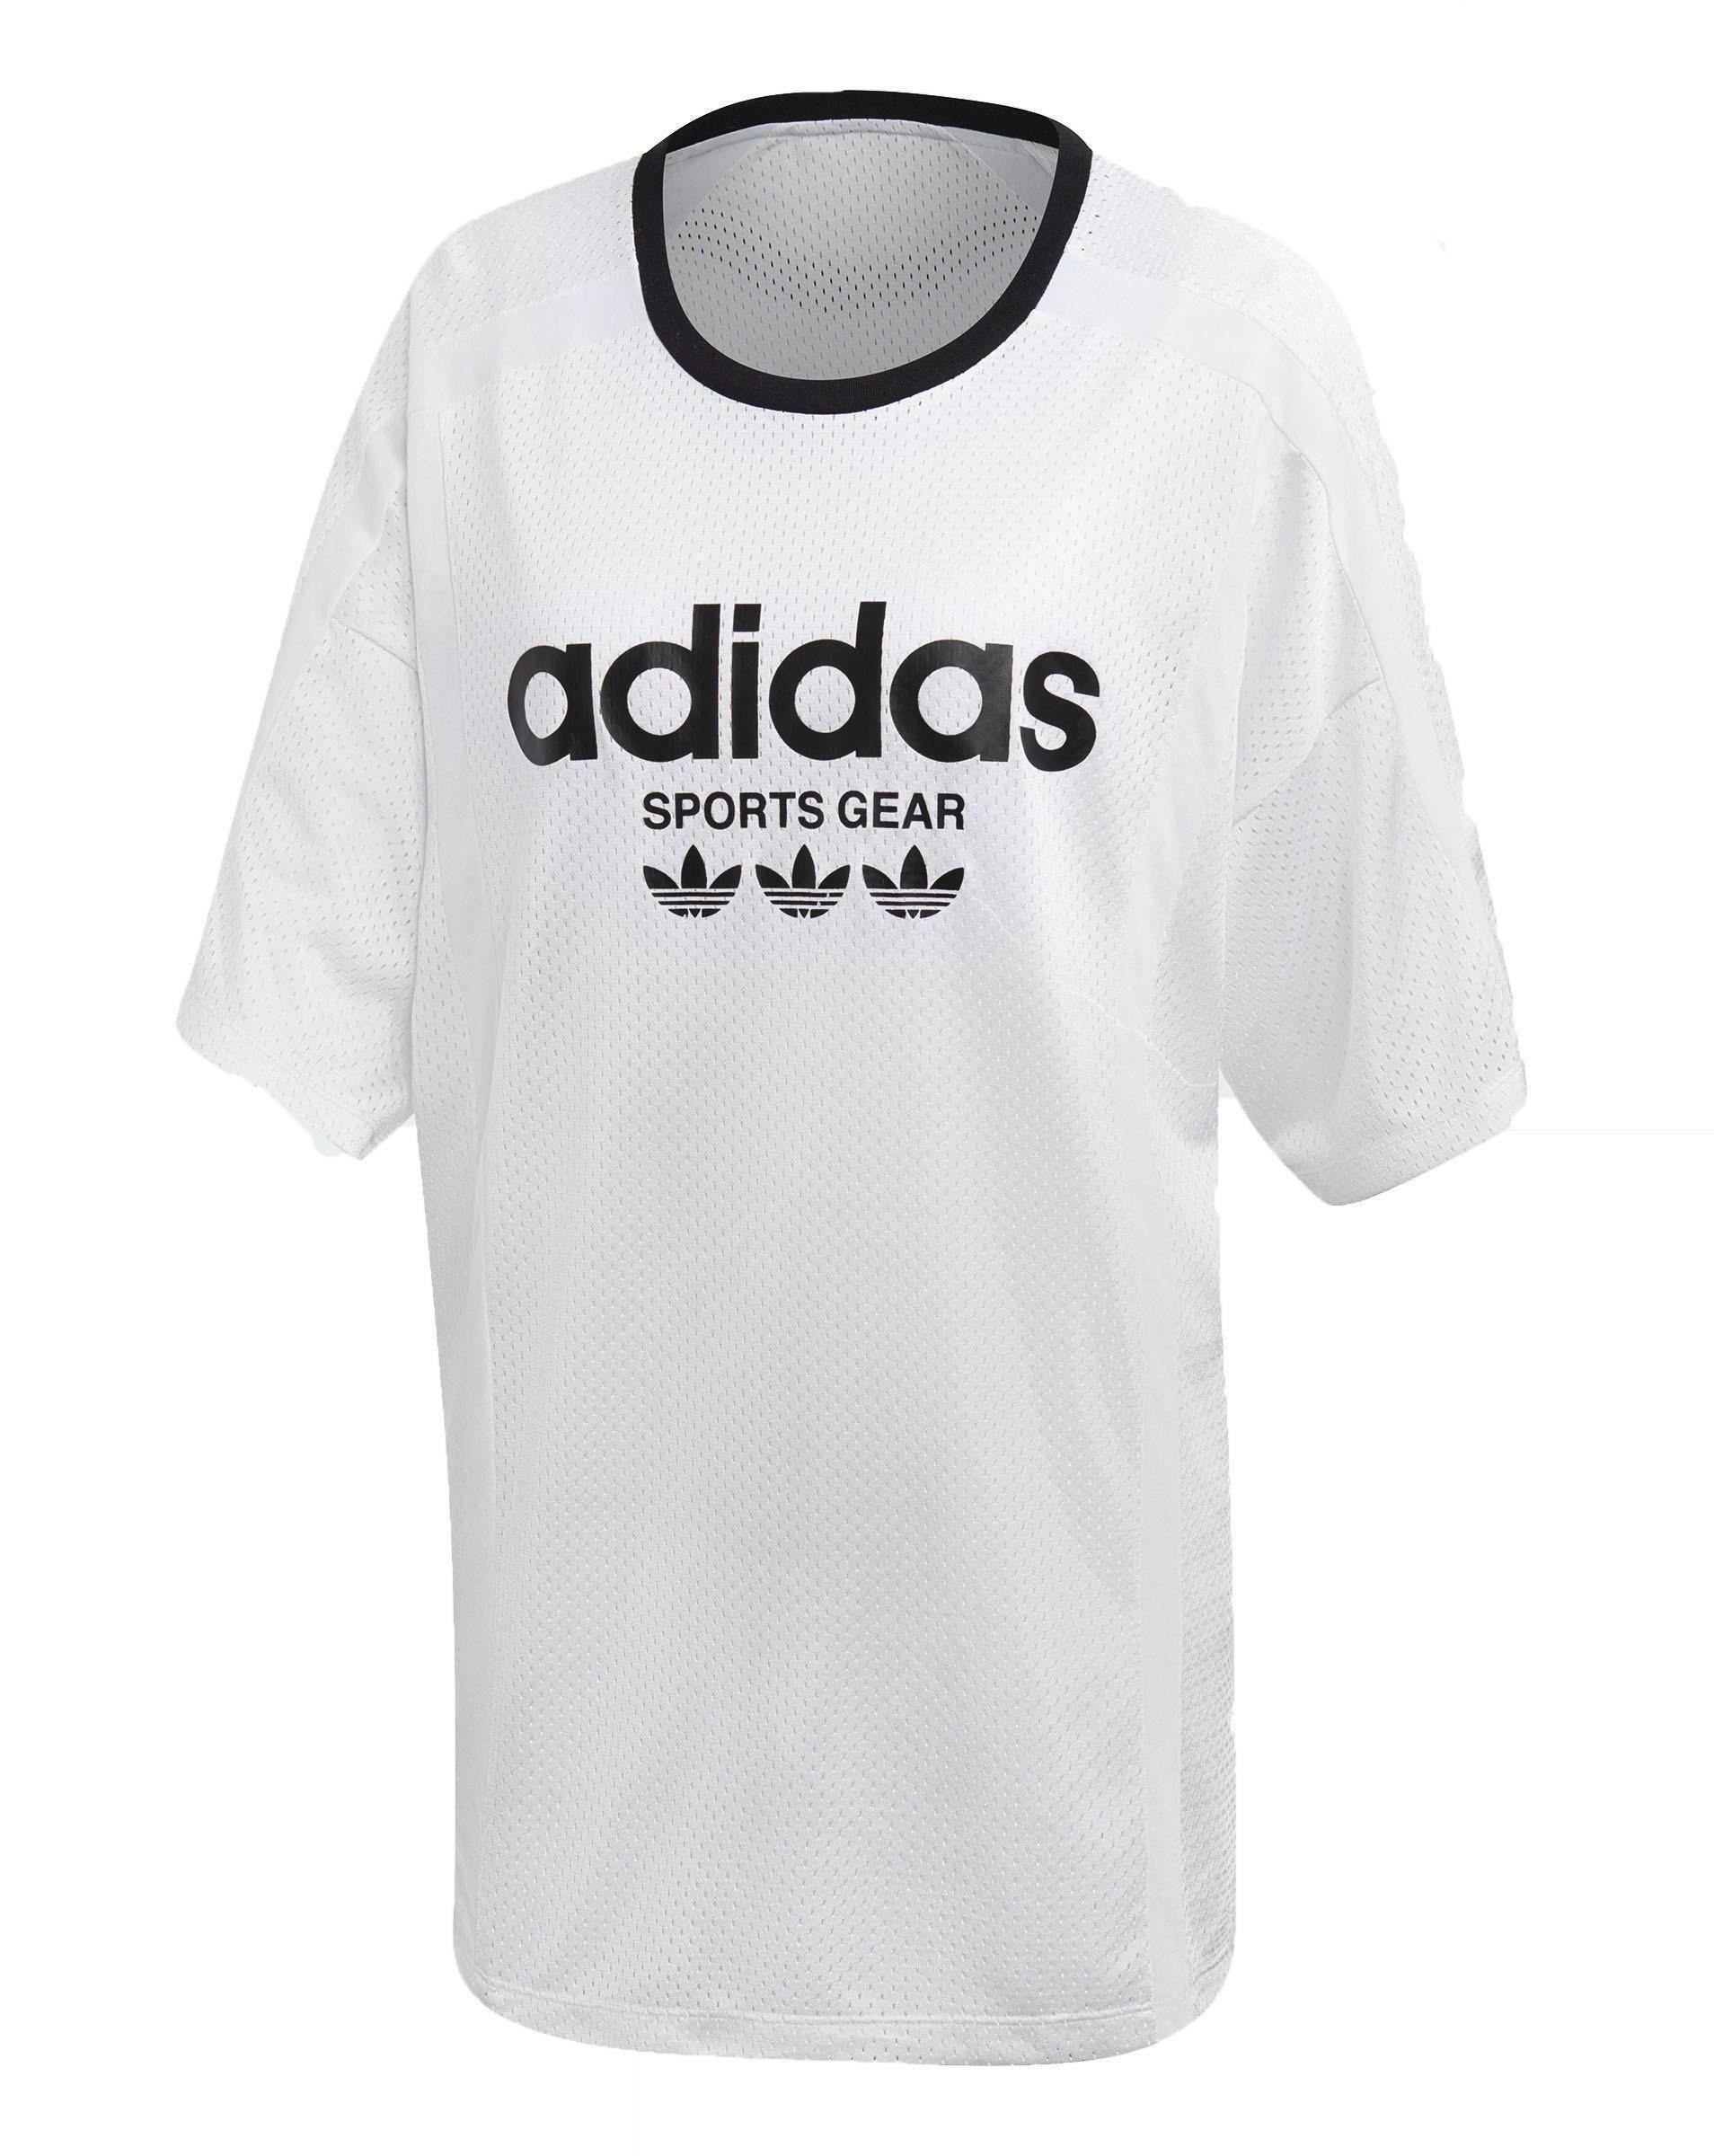 adidas adidas mesh t-shirt donna bianca ce4185